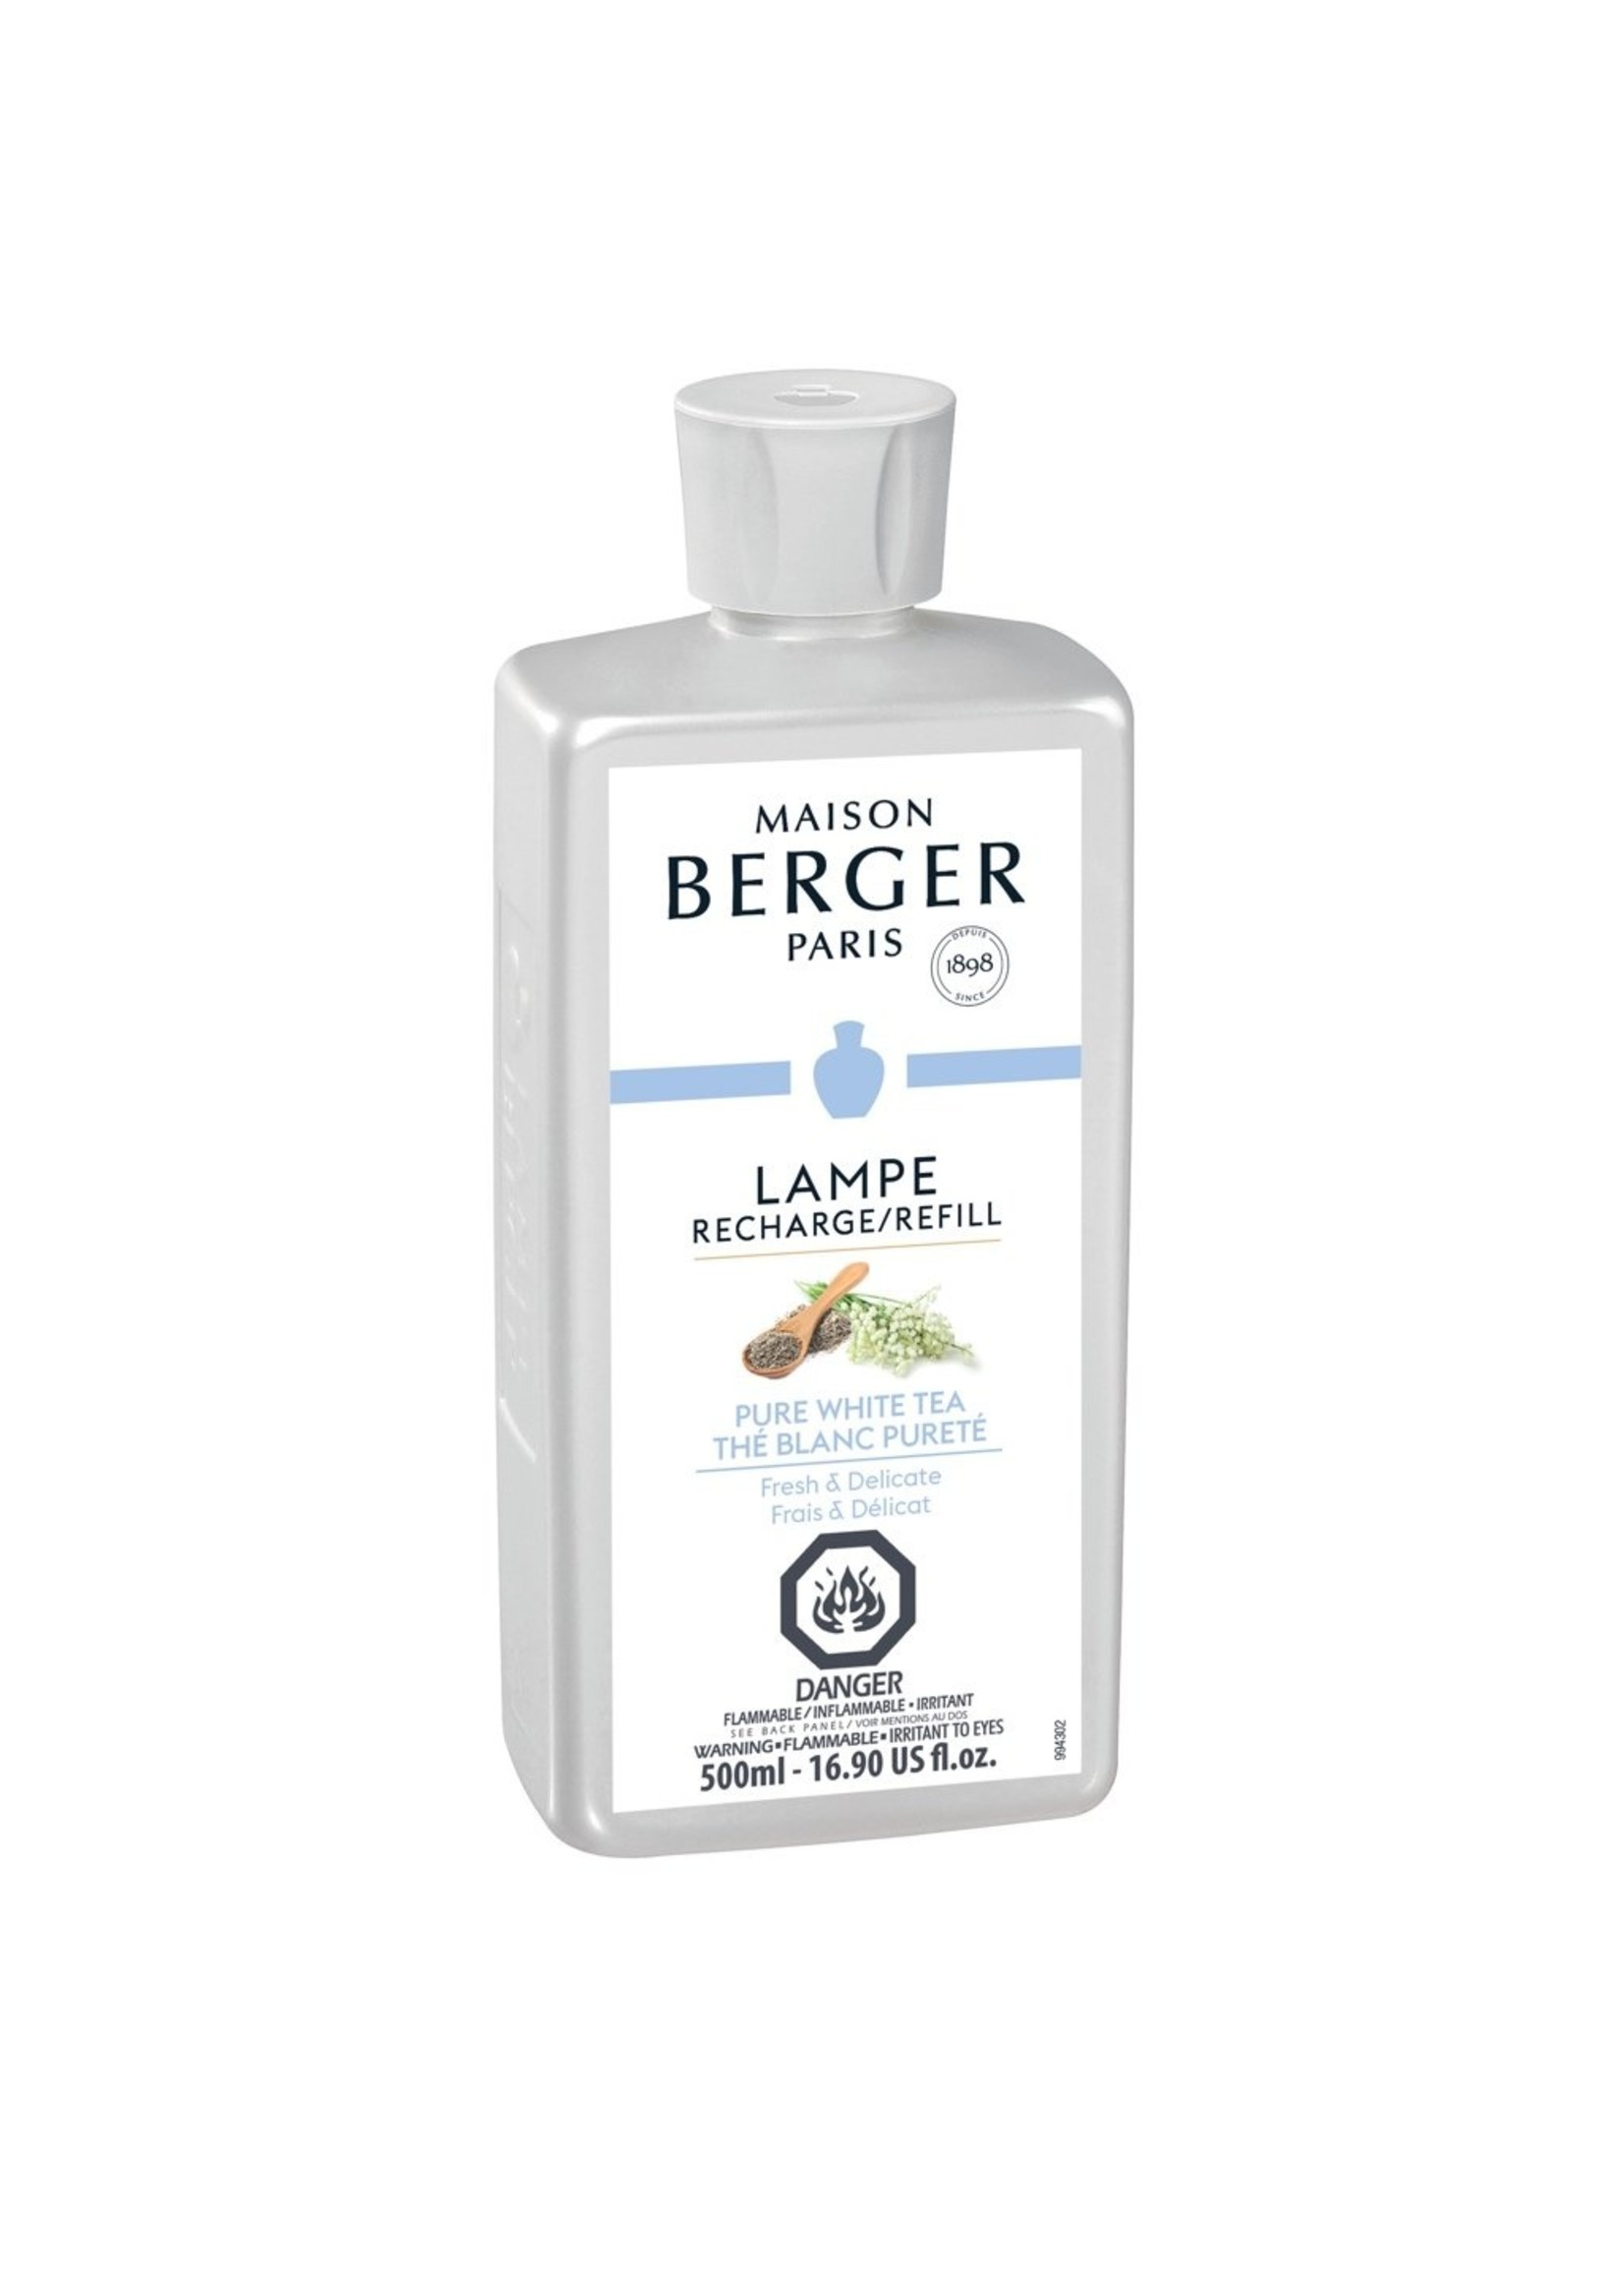 Maison Berger Pure White Tea